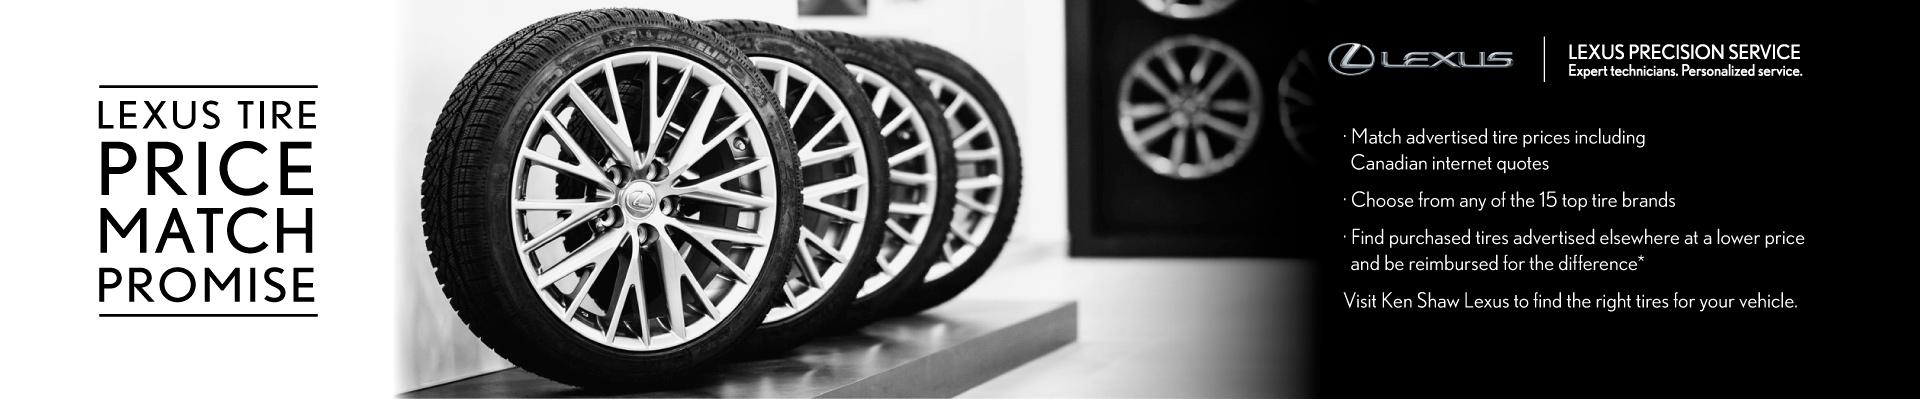 Ken Shaw Lexus Tire Price Match Promise in Toronto Ontario GTA